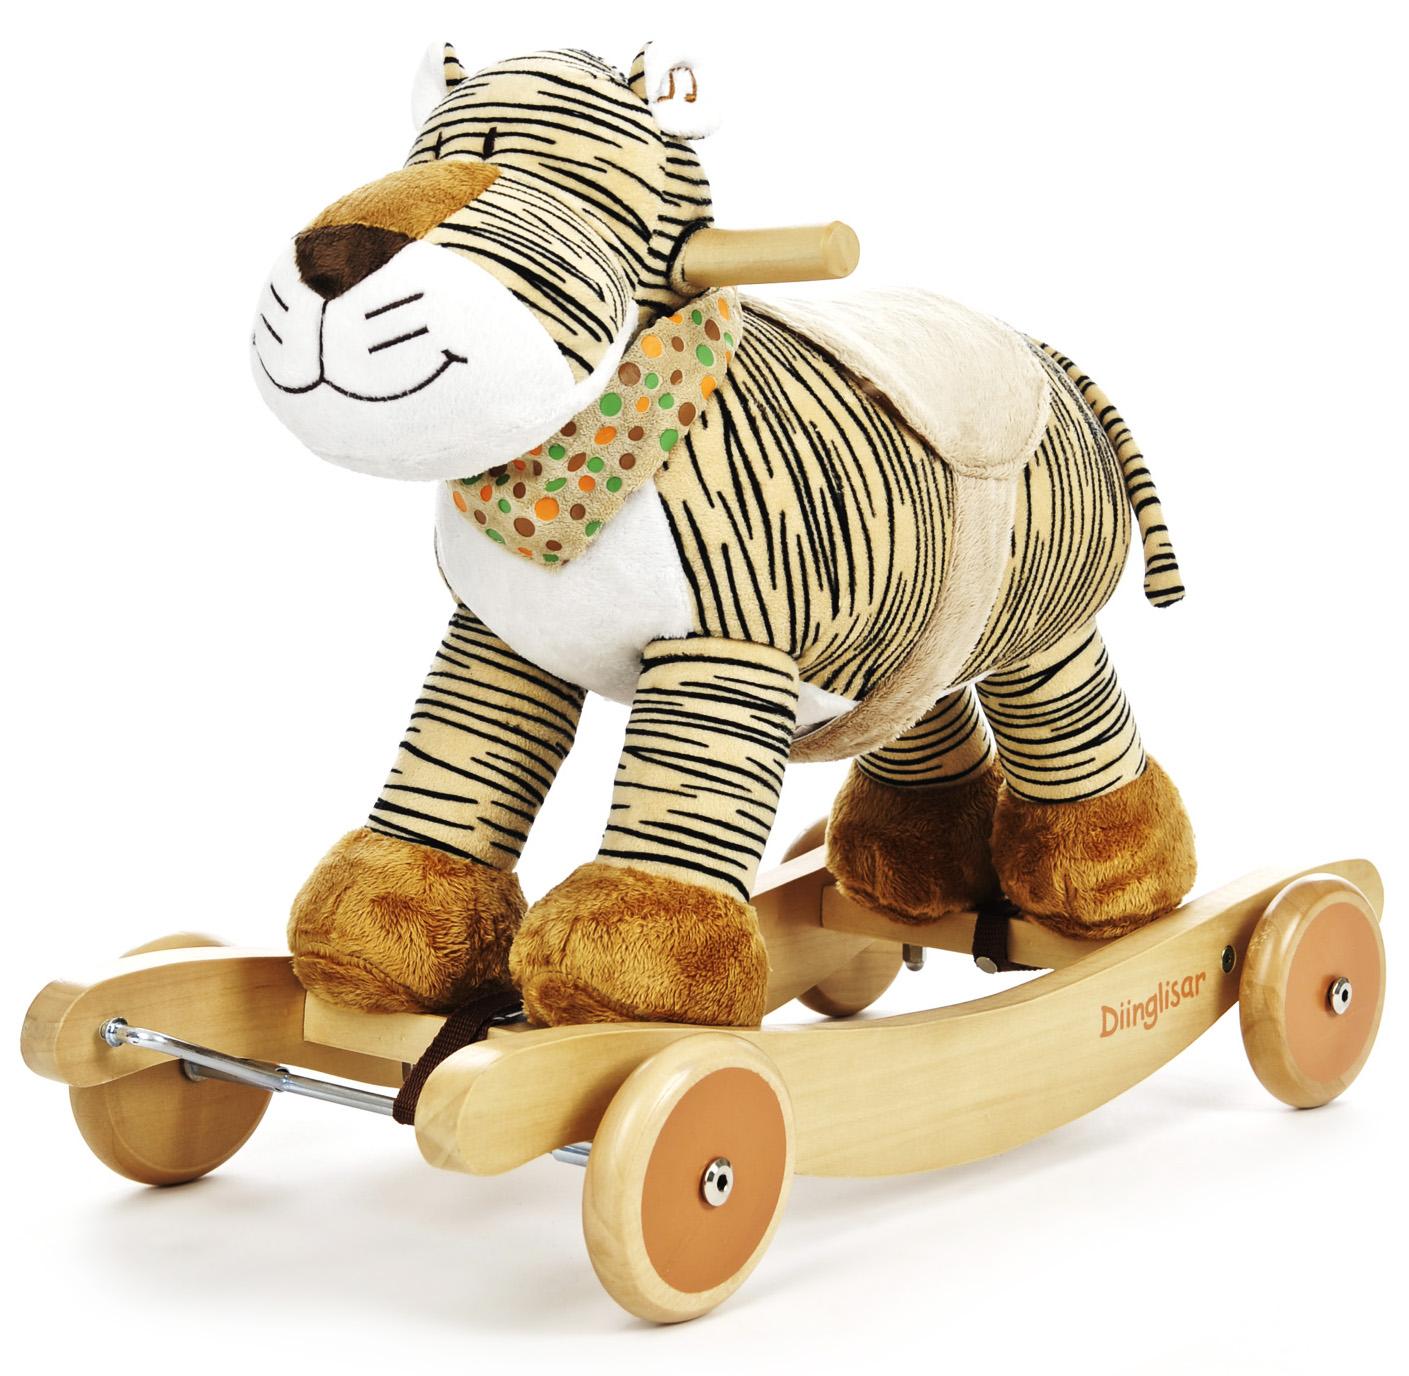 Diinglisar Gungdjur, Tiger - Teddykompaniet